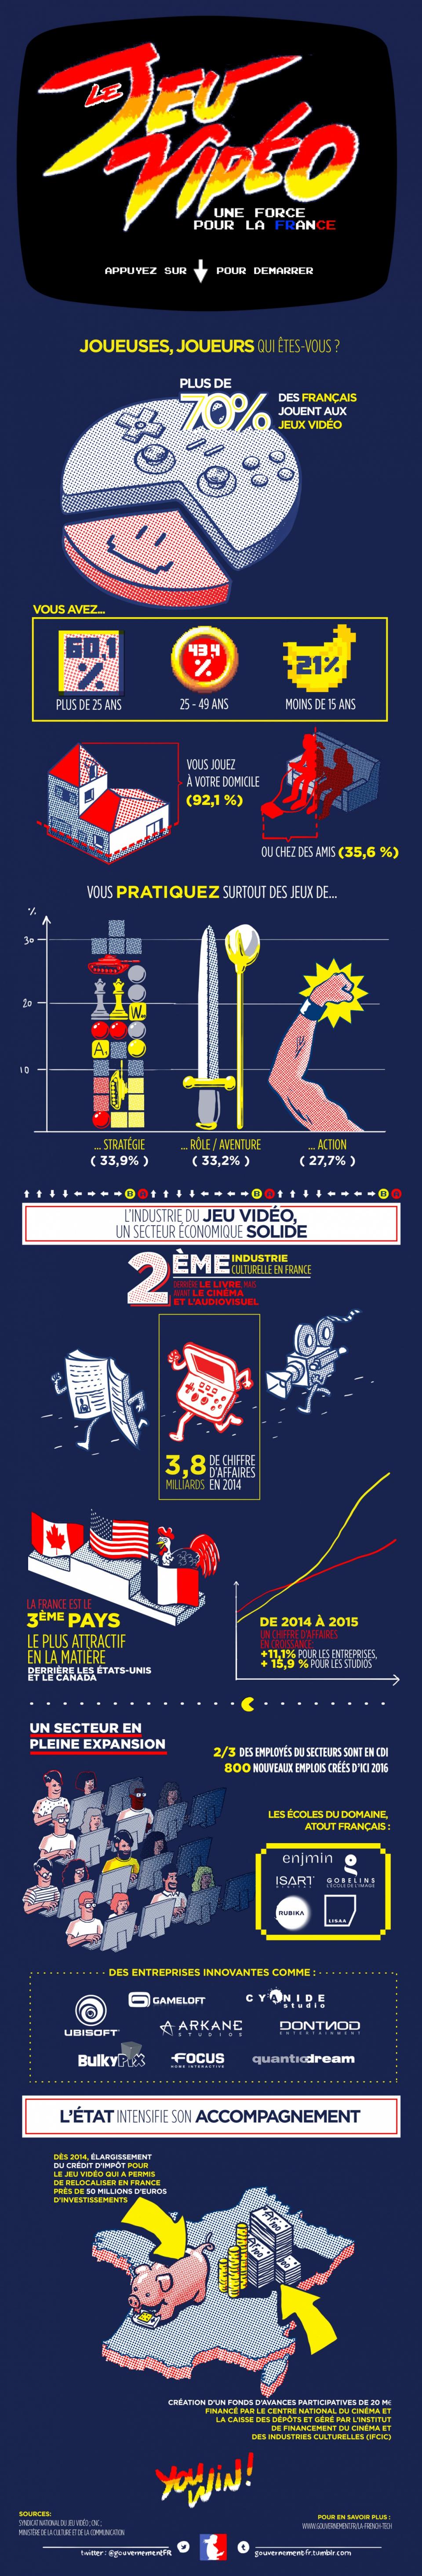 http://www.gouvernement.fr/sites/default/files/styles/plein-cadre/public/affiche/affiche/2015/10/paris_game_week_infographie2b.jpg?itok=Diny7oOu